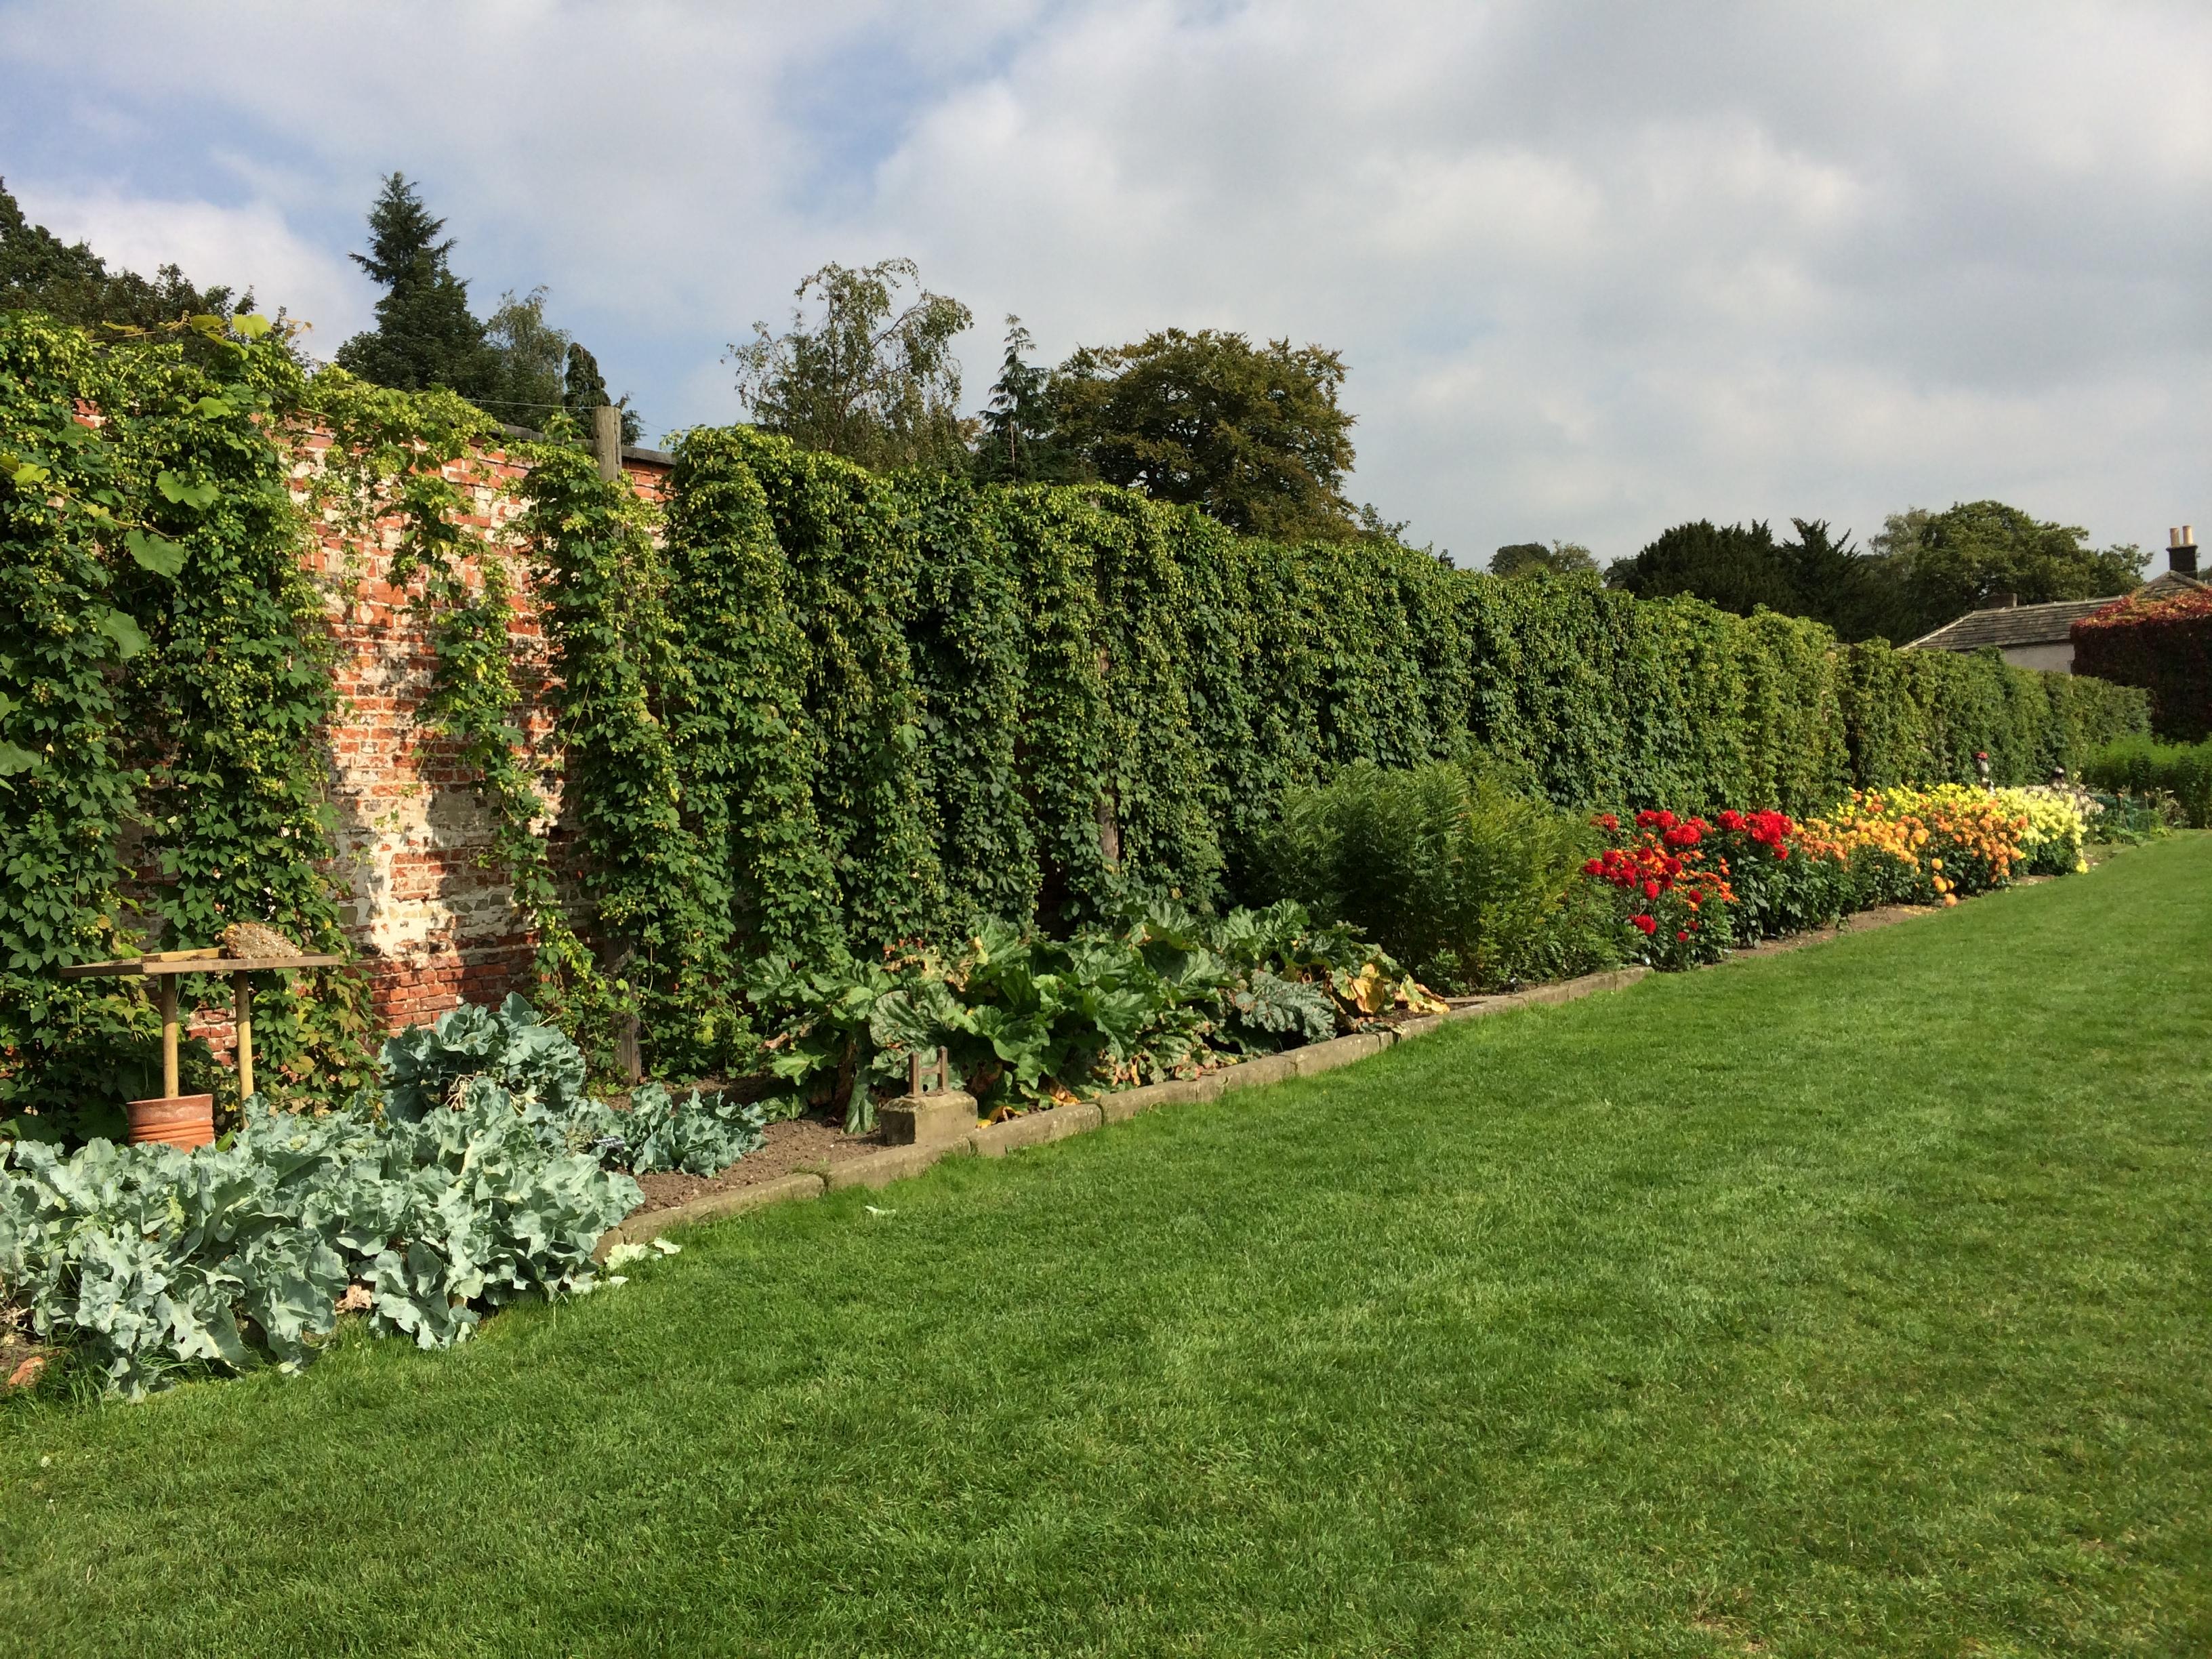 Harewood House has an popular walled garden